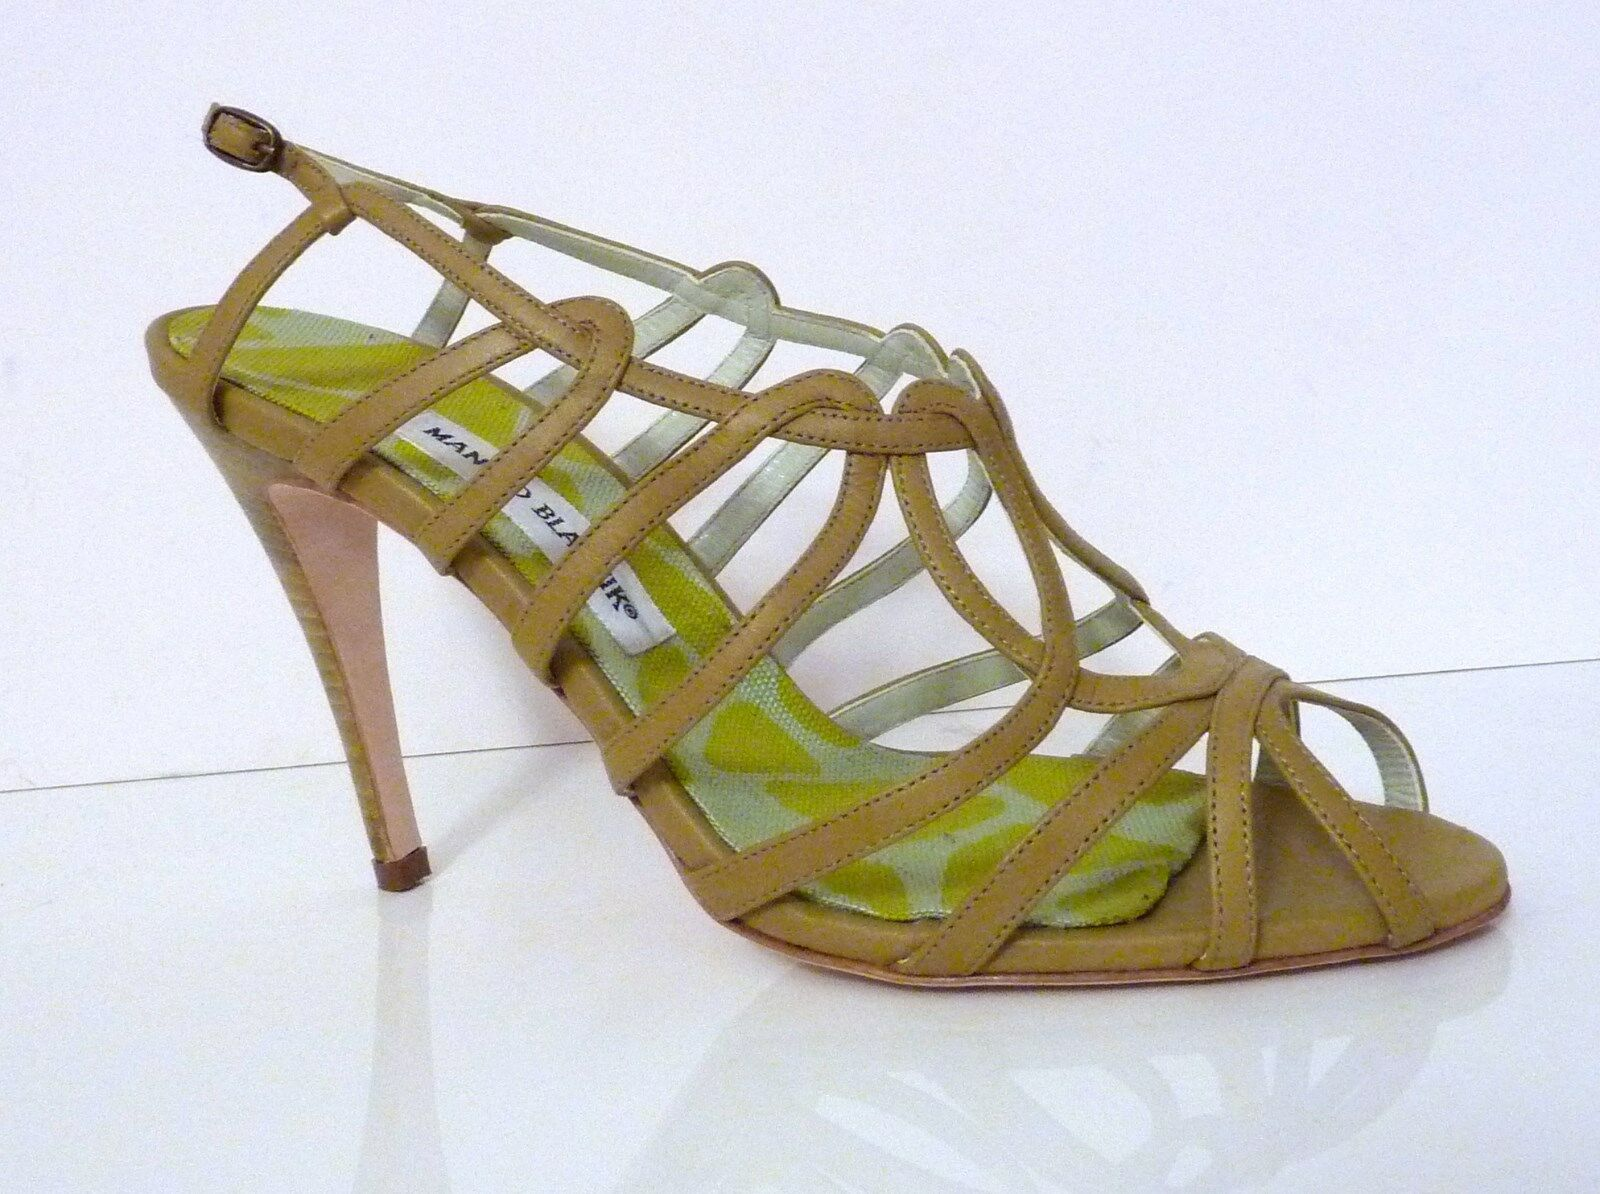 MANOLO BLAHNIK scarpe STRAPPY LIGHT verde LEATHER SANDALS Sz 40.5  Made